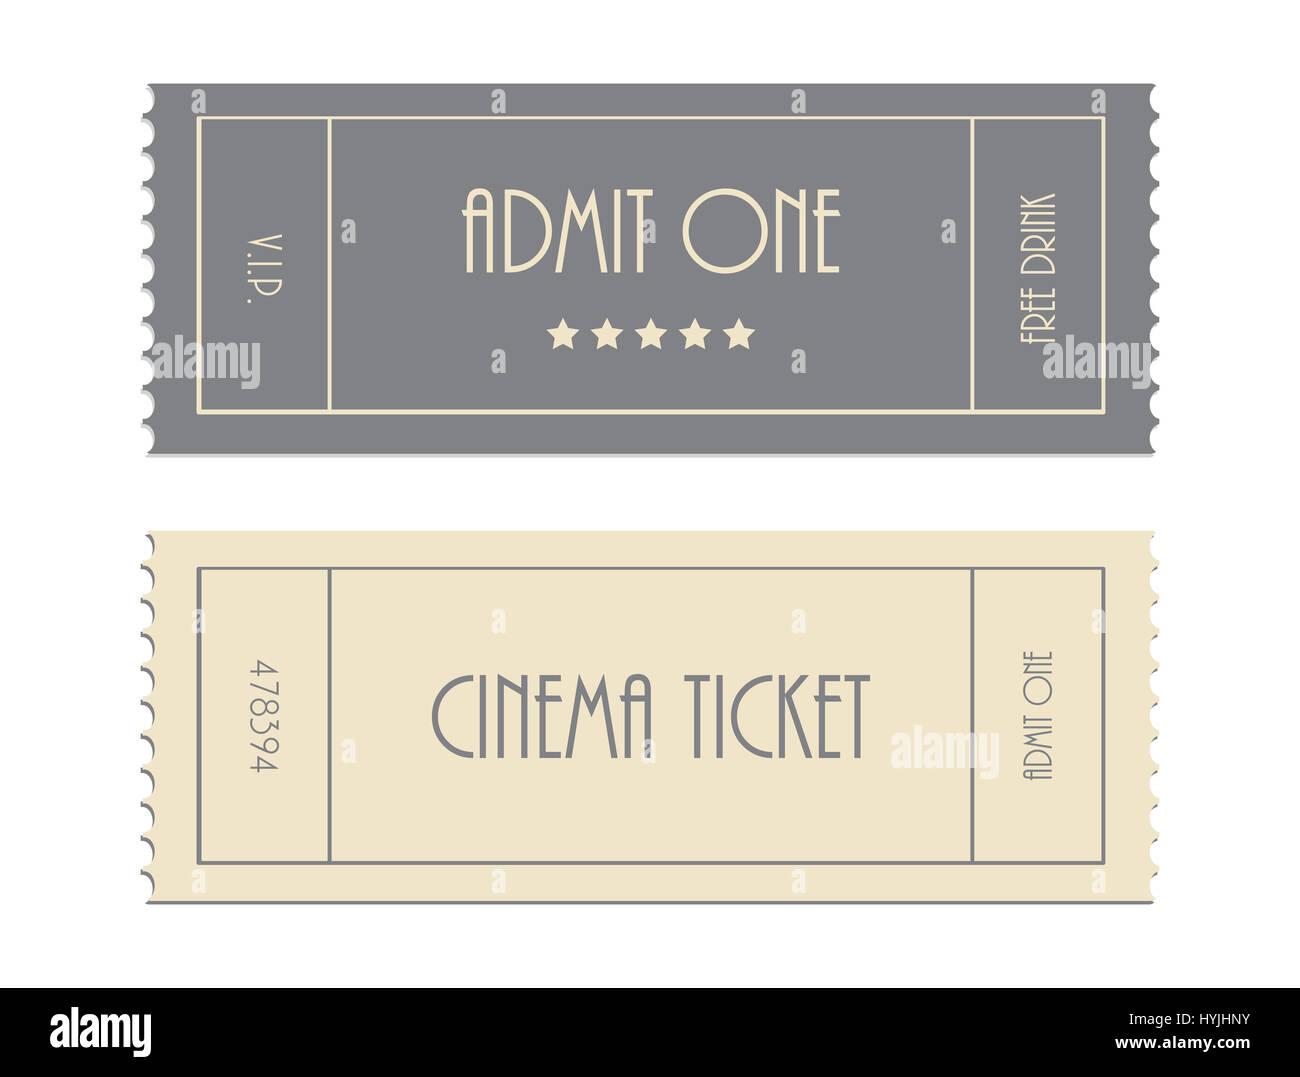 Party Entrance Ticket Icon Stockfotos & Party Entrance Ticket Icon ...